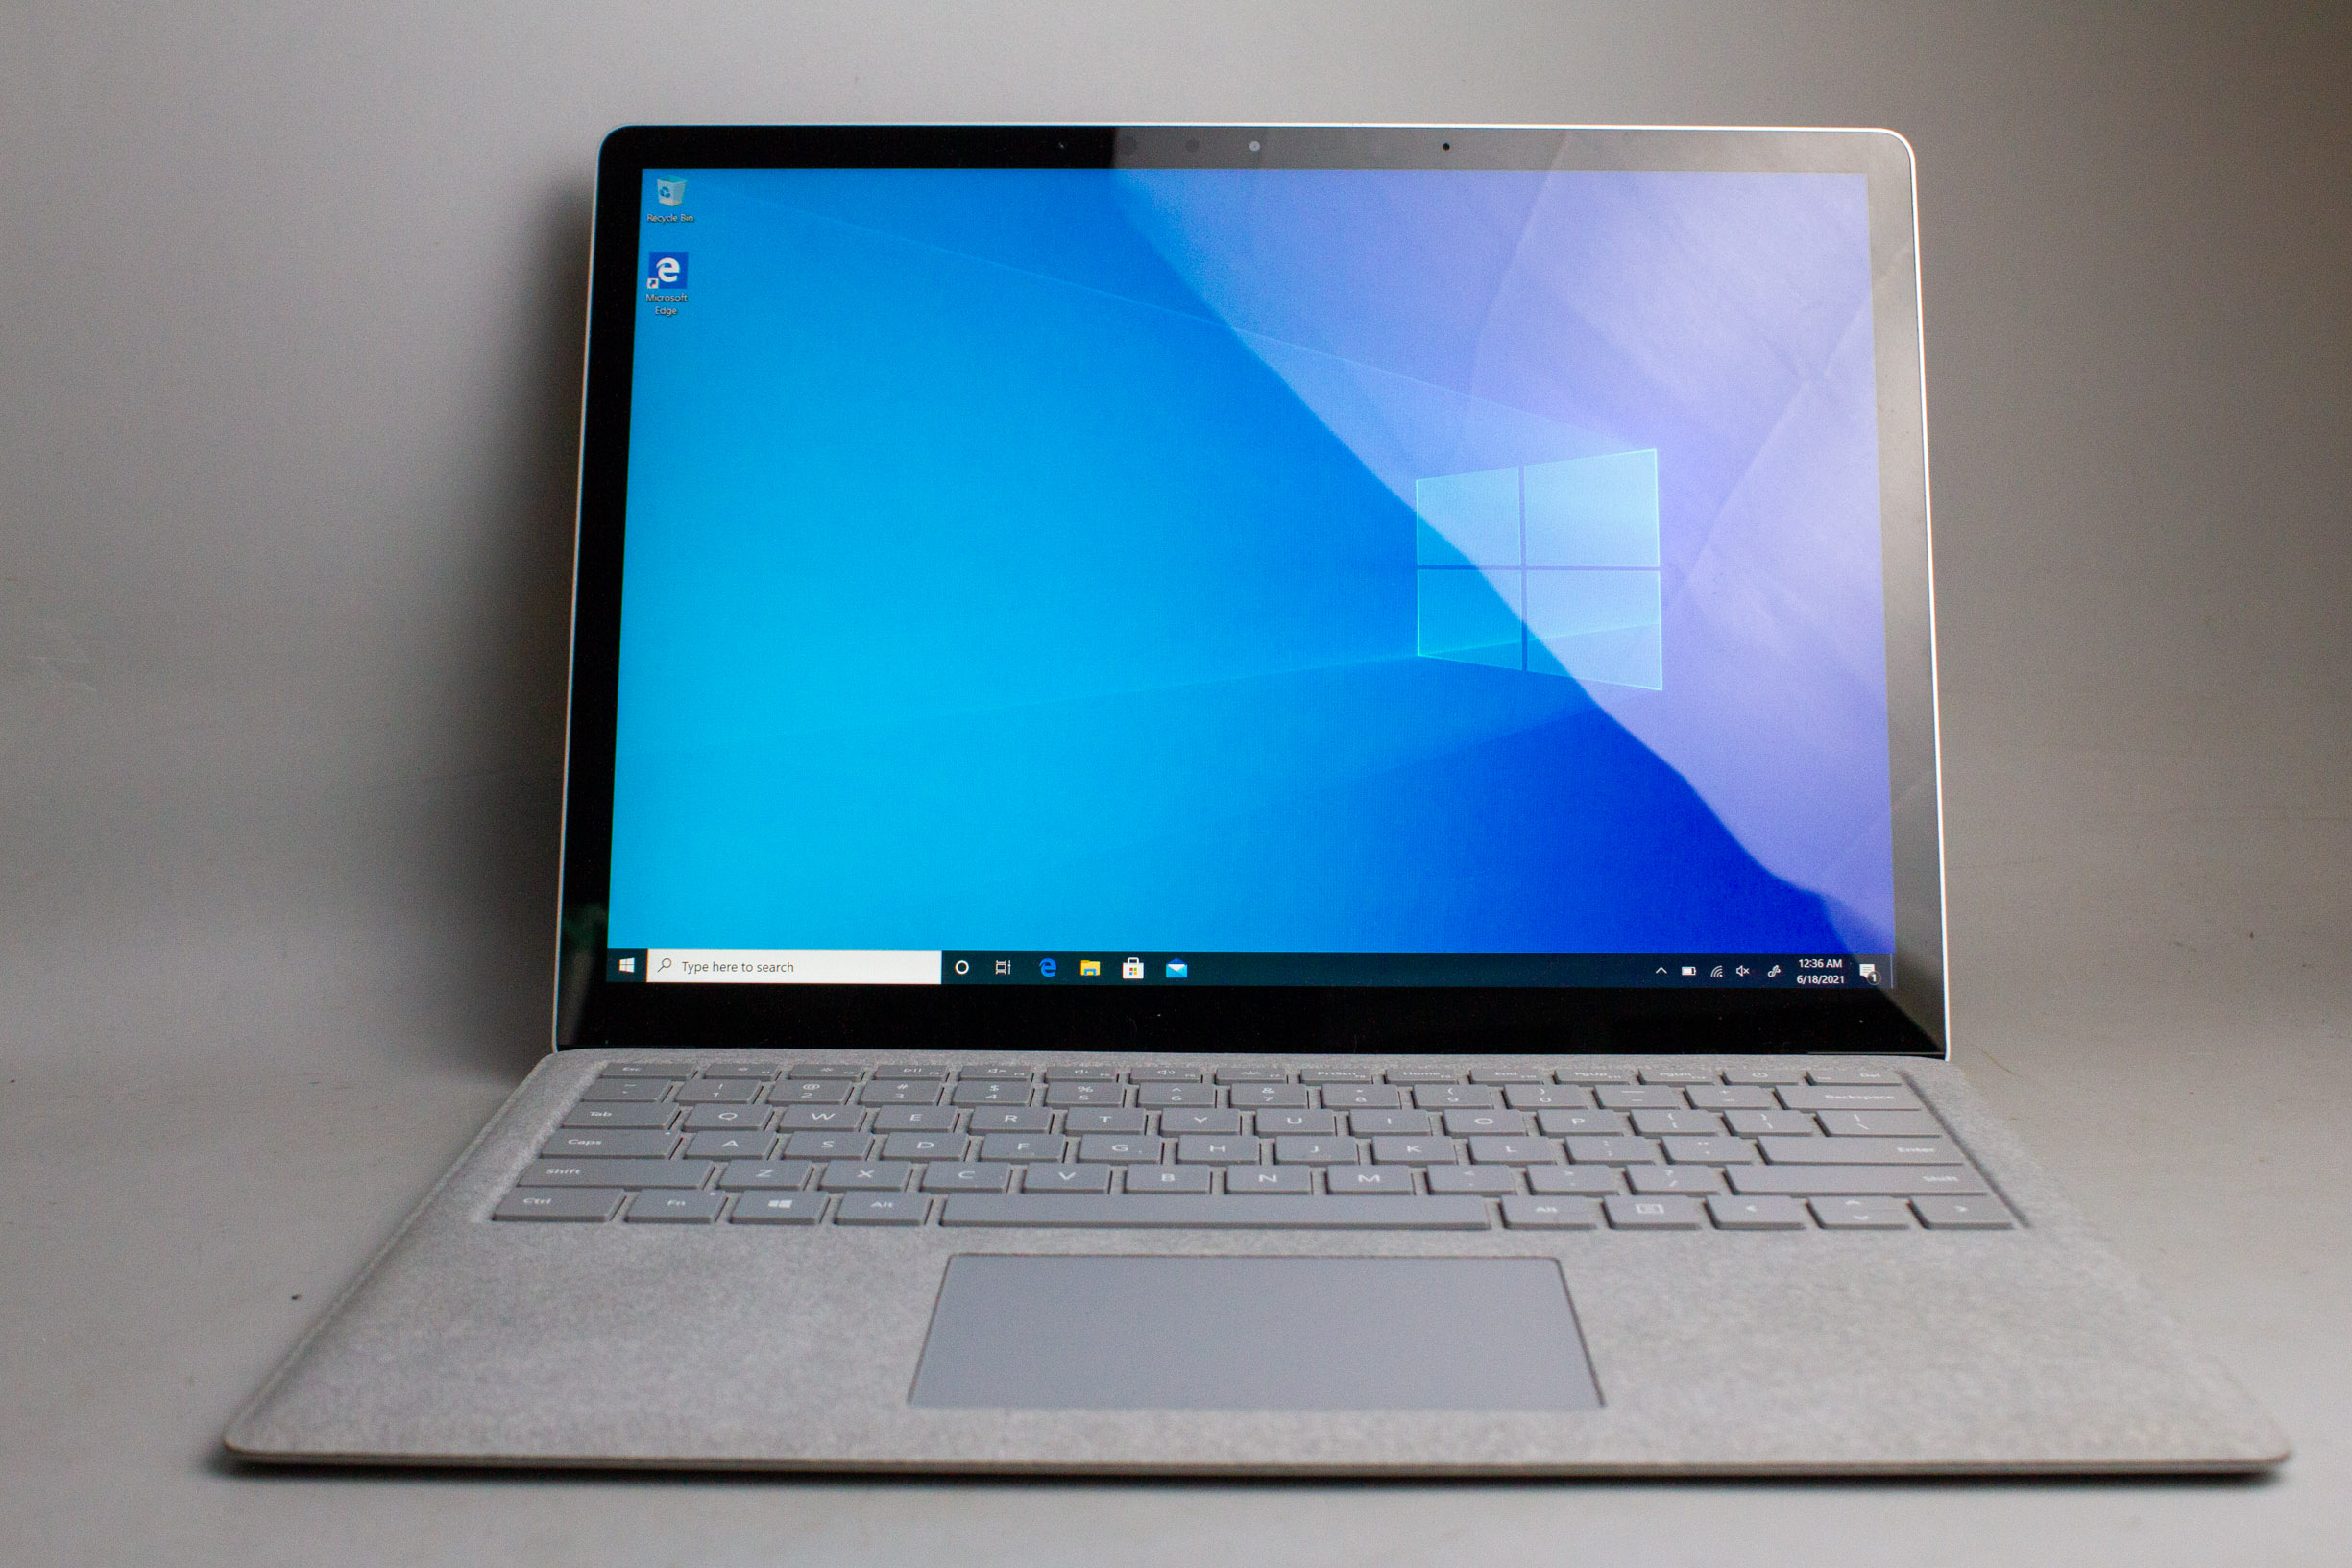 surface-laptop-2-ssd-512gb-core-i7-8650u-ram-16gb-98-18836